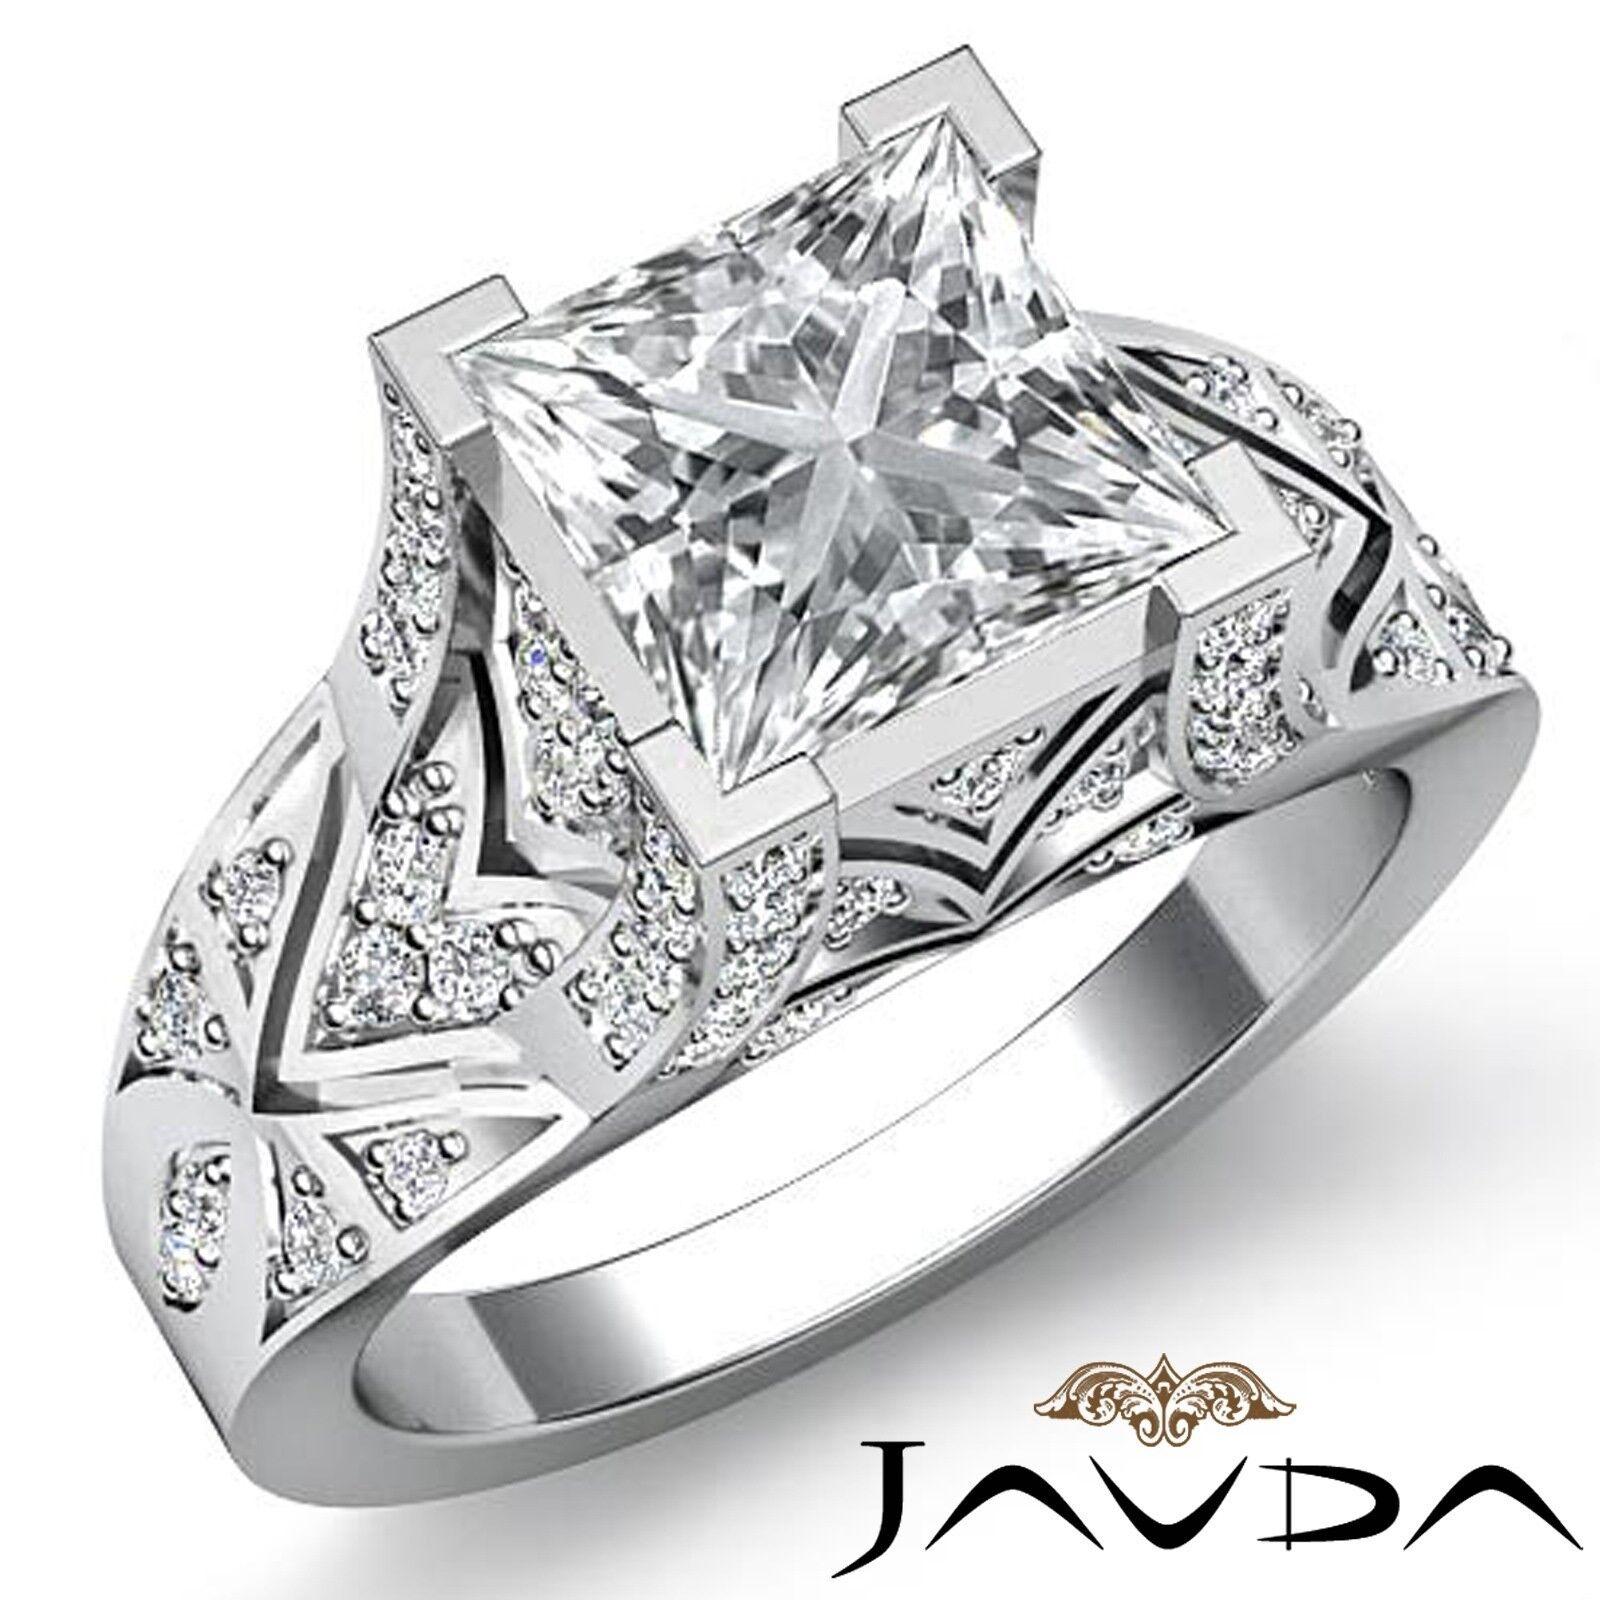 1.91ctw Antique Pave Princess Diamond  Engagement Ring GIA E-VVS1 White Gold